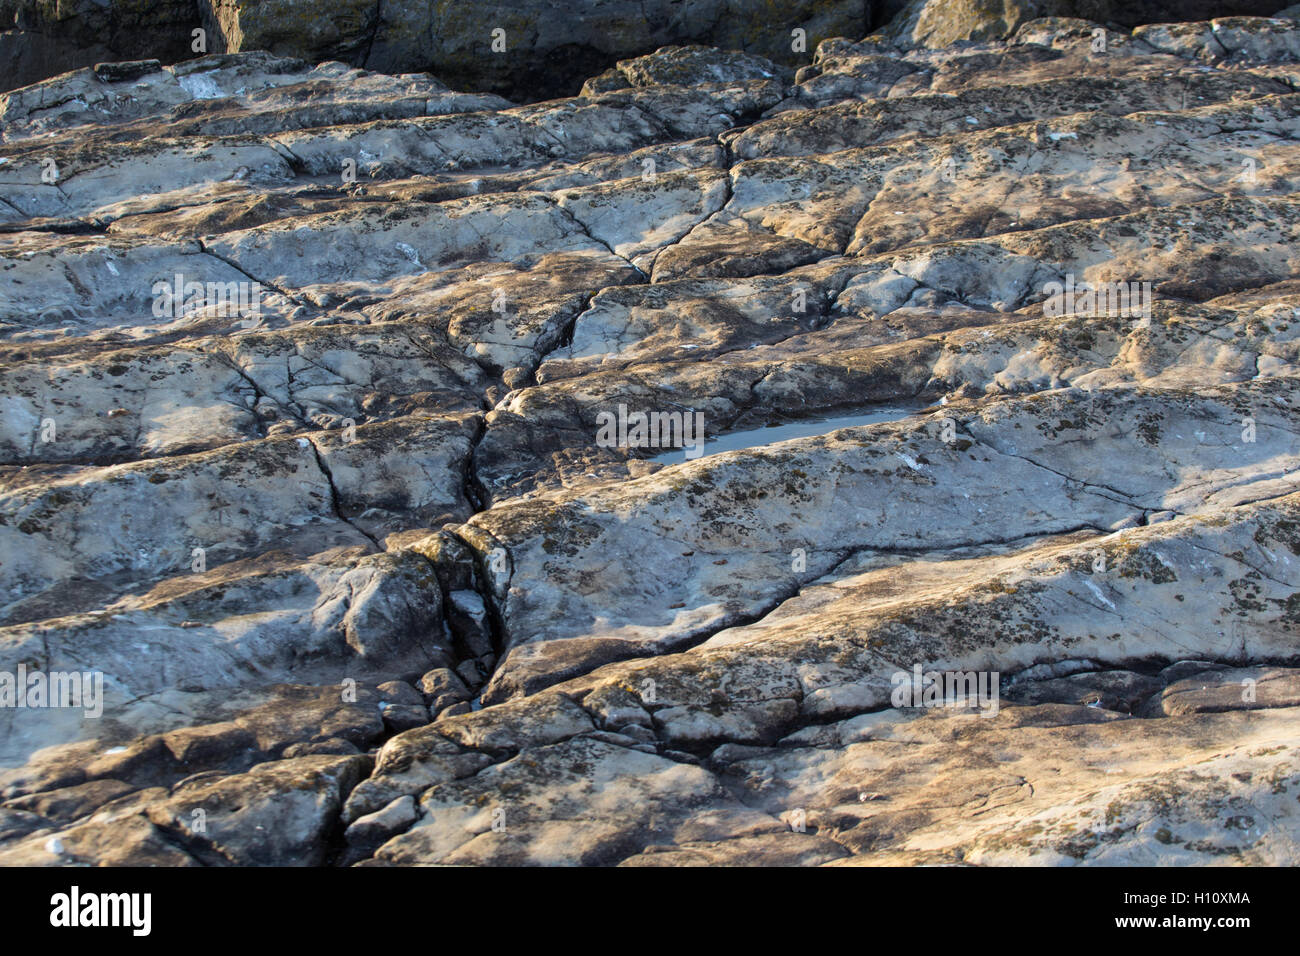 Unique Ocean Floor fossil on Flat Holm Island - Stock Image